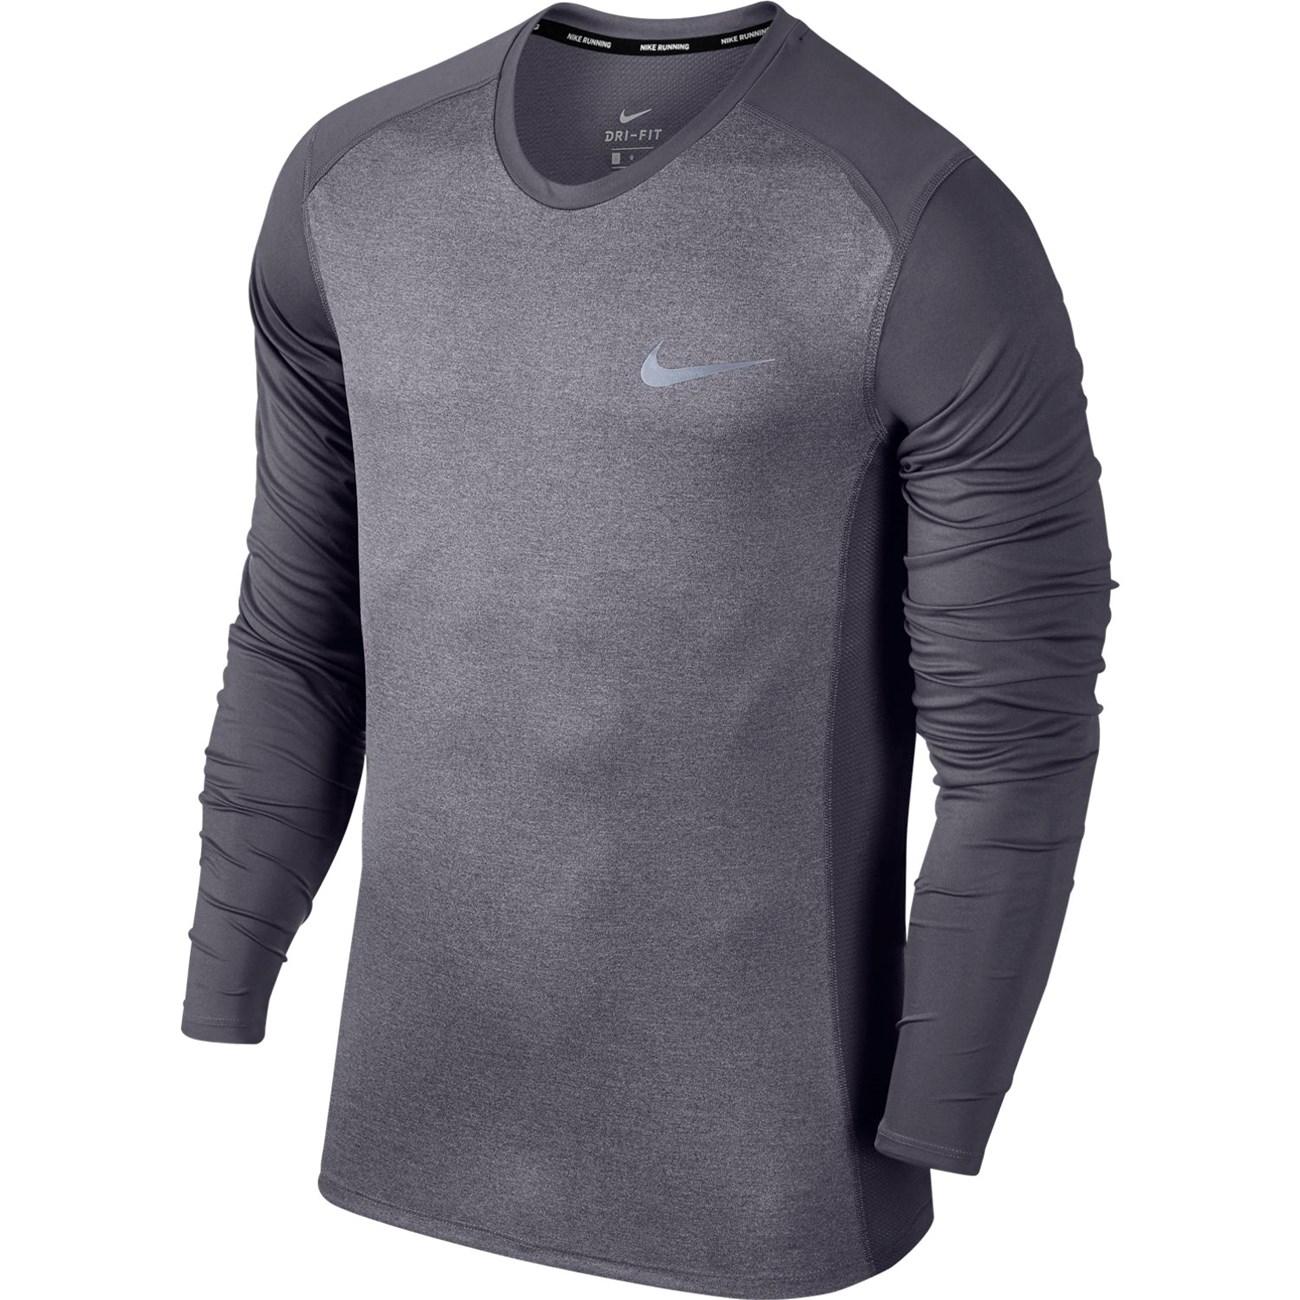 NIKE M NIKE MILER TOP LS   Ανδρικά Μακρυμάνικα T-shirts  ff53d957d54